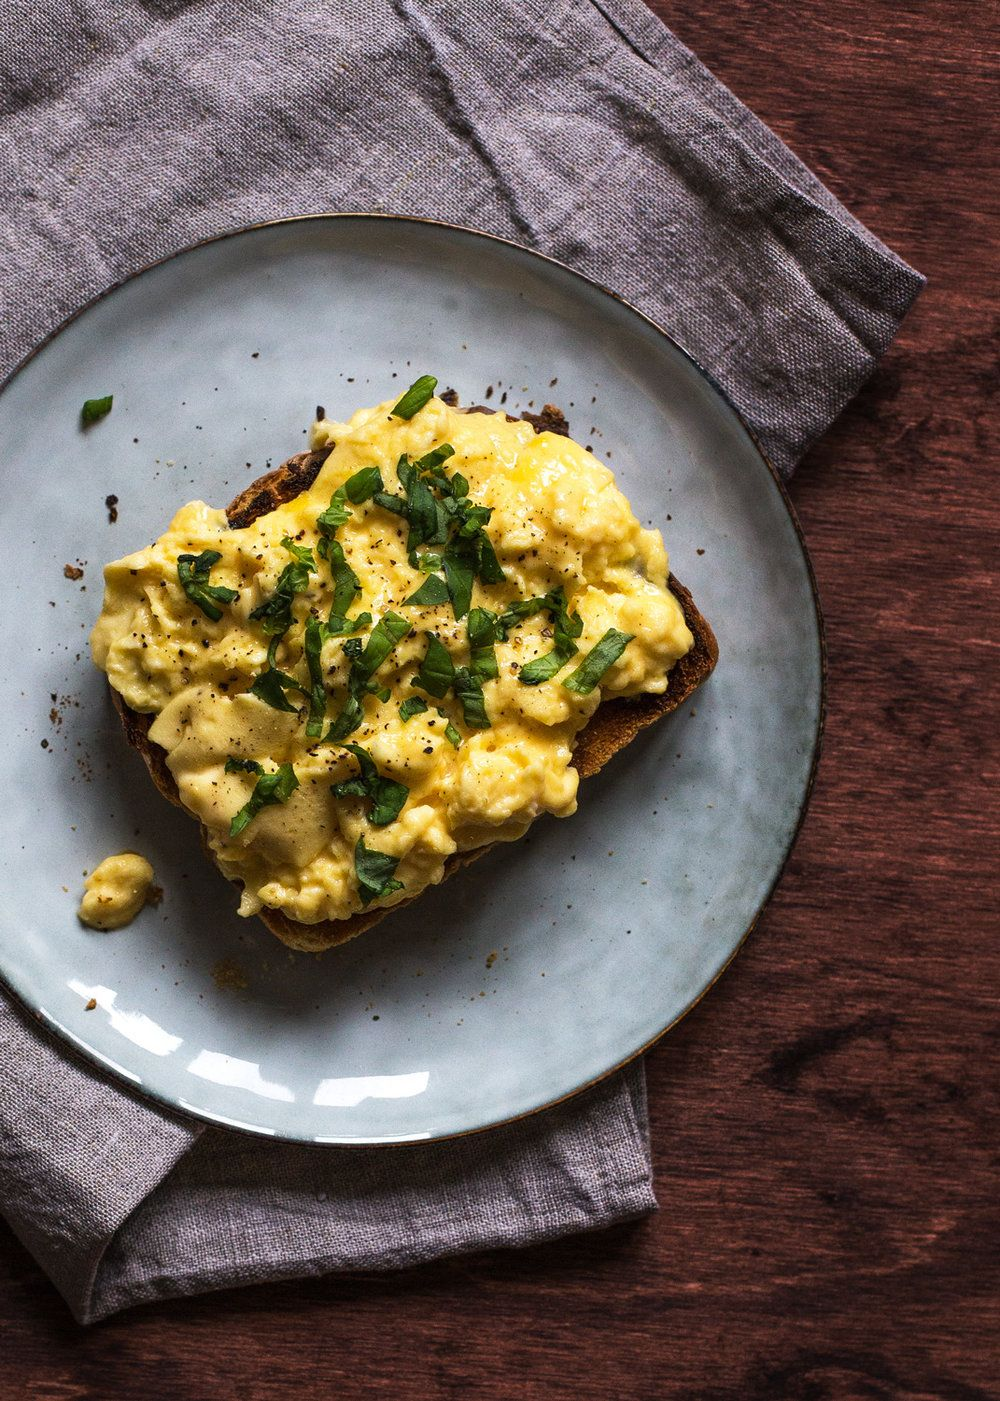 Scrambled eggs | Kimberley Chan Photography